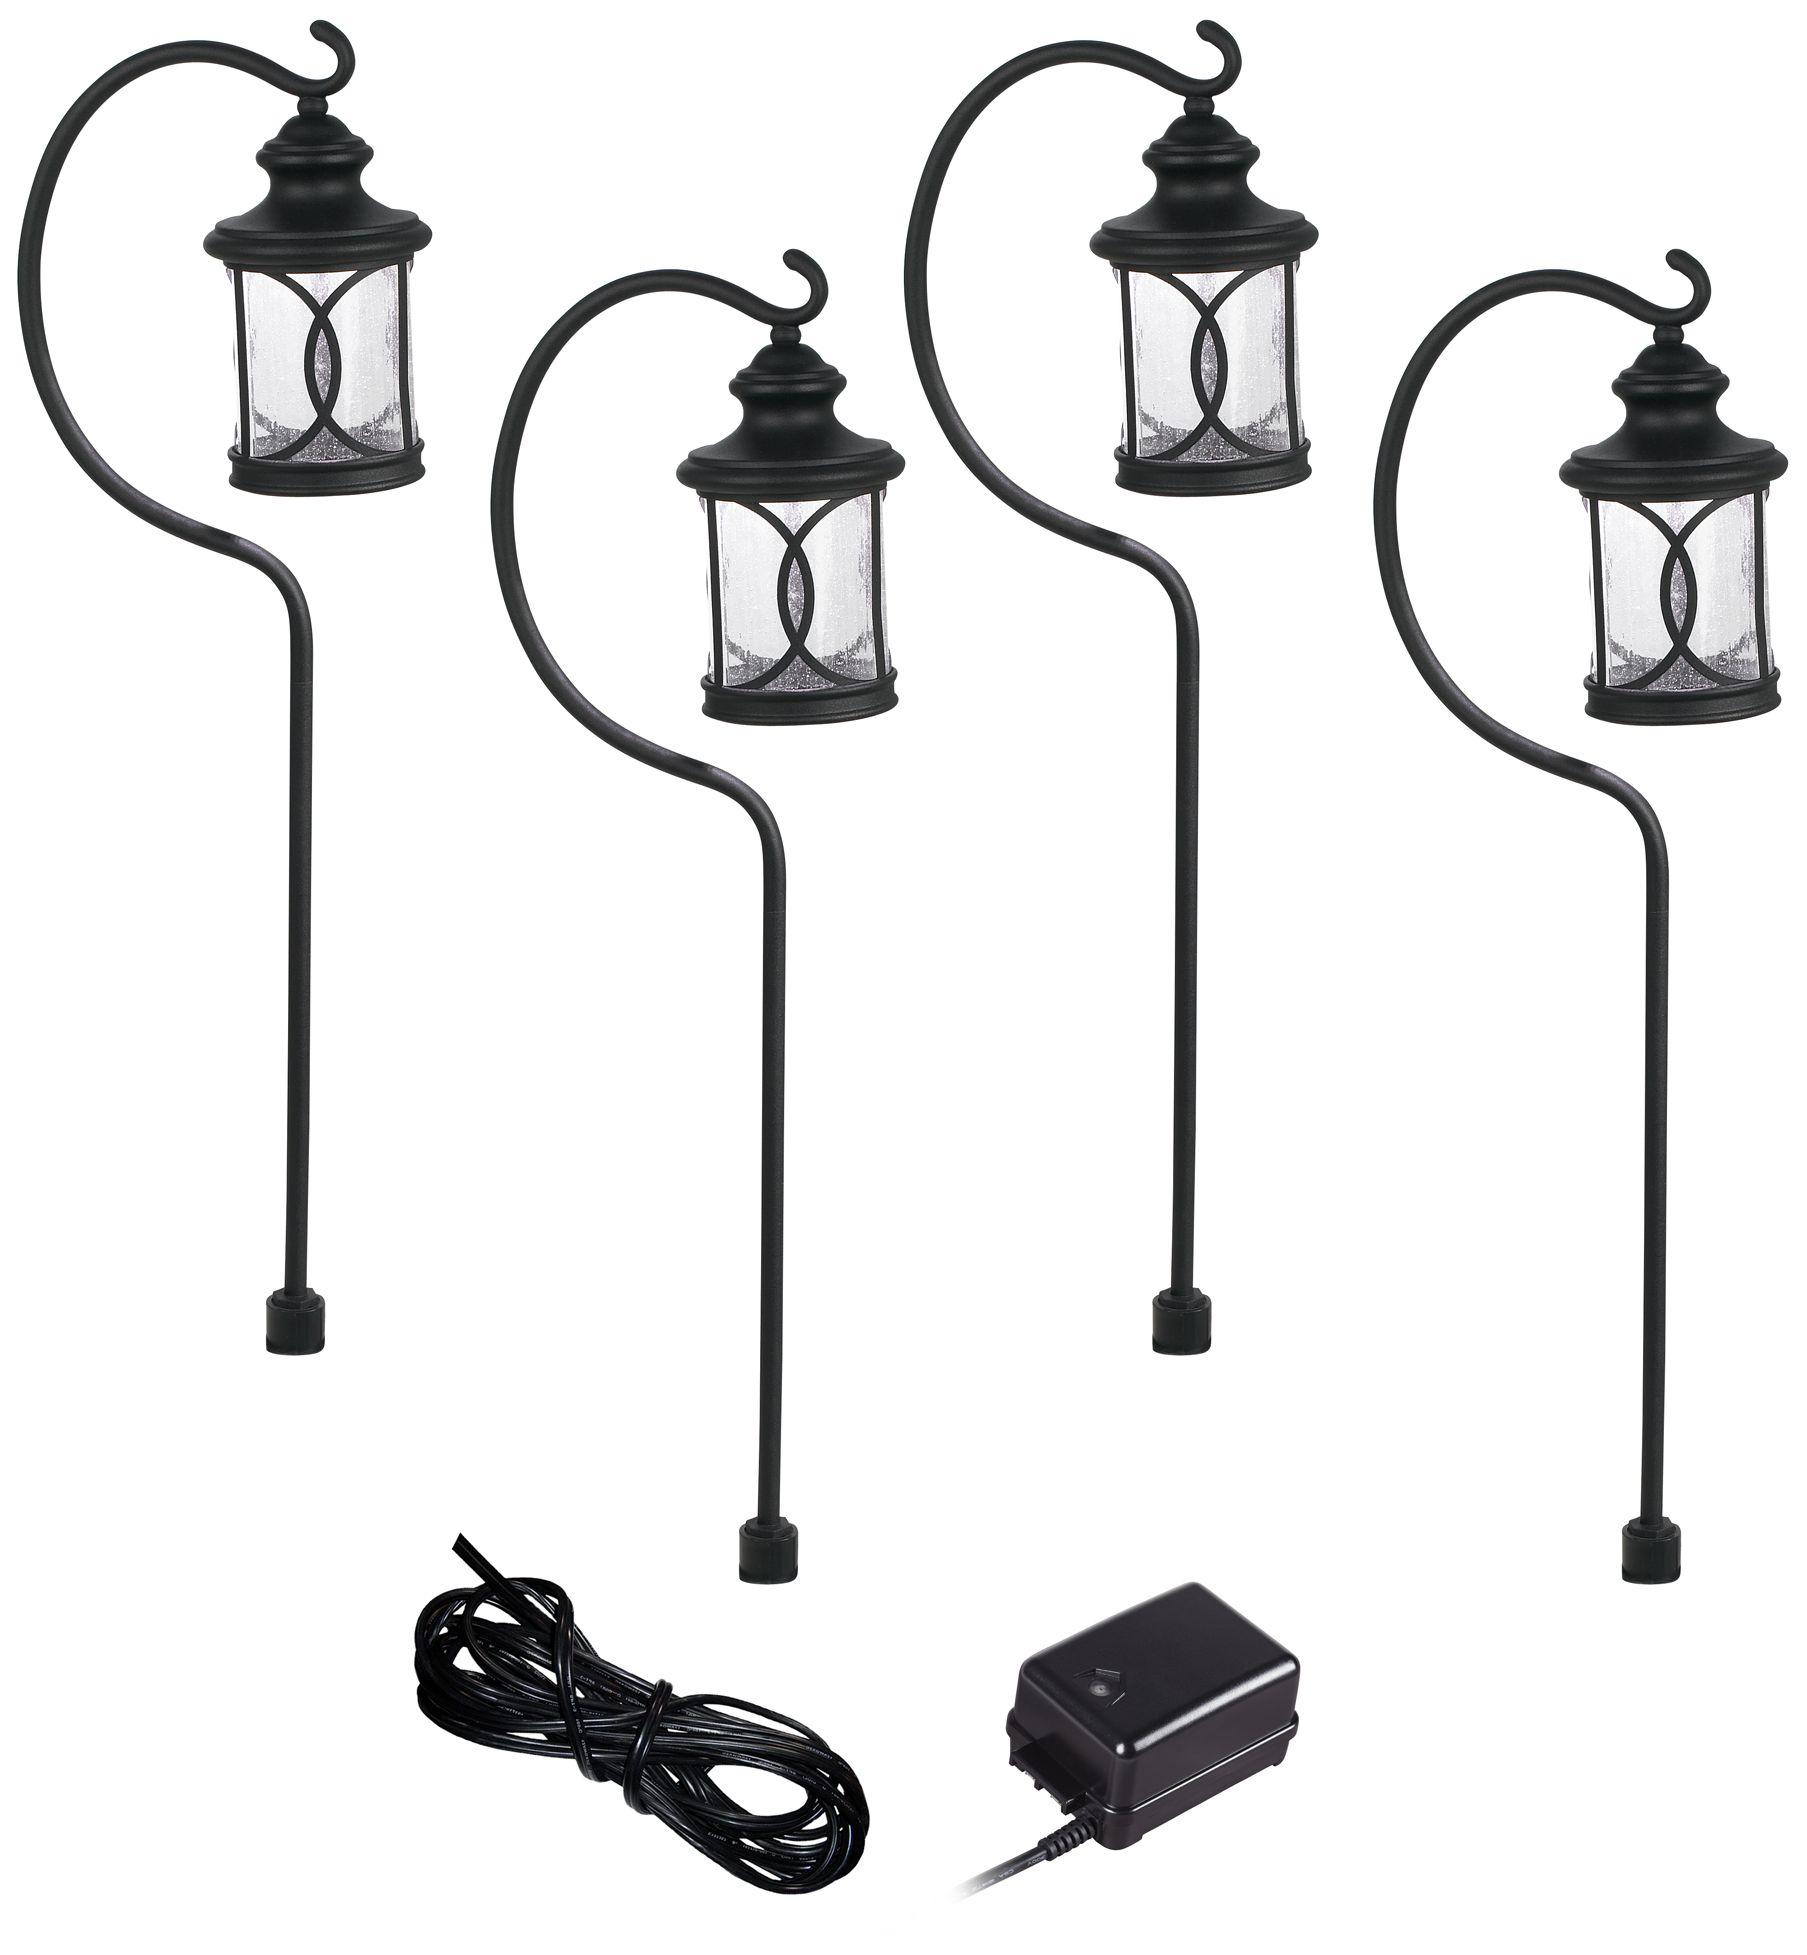 Captivating Capistrano Black 4 Path Light LED Landscape Lighting Kit